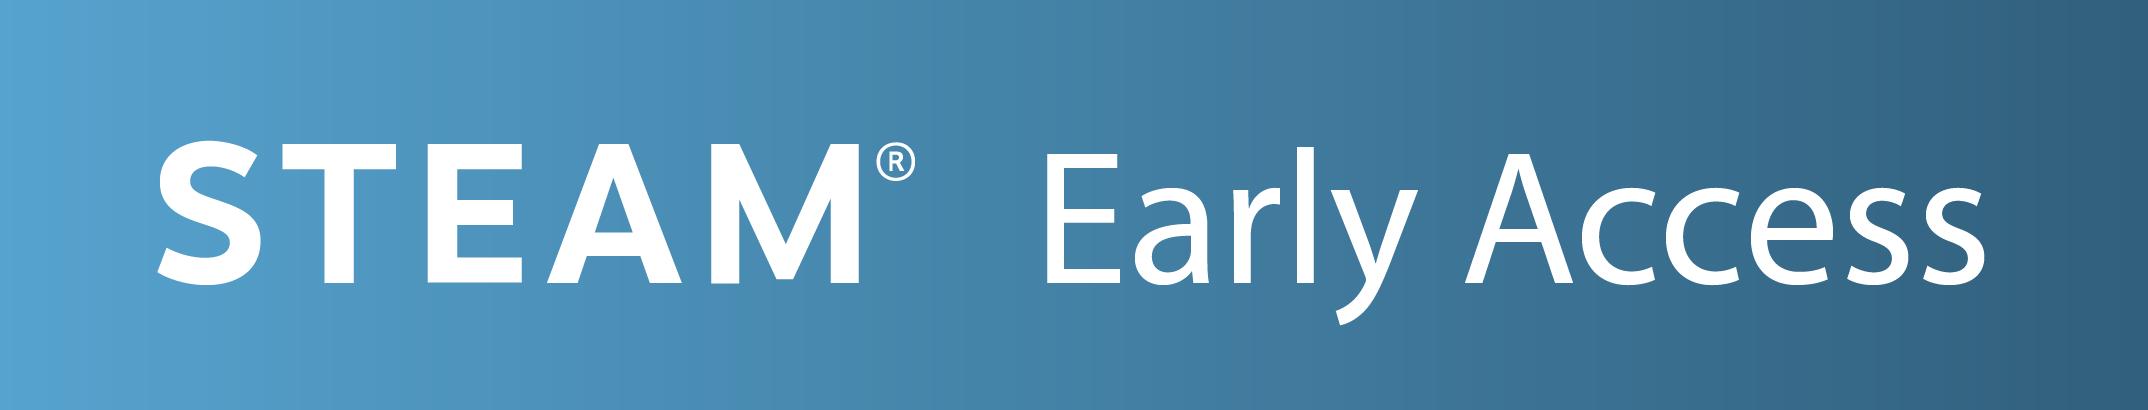 steam early access logo